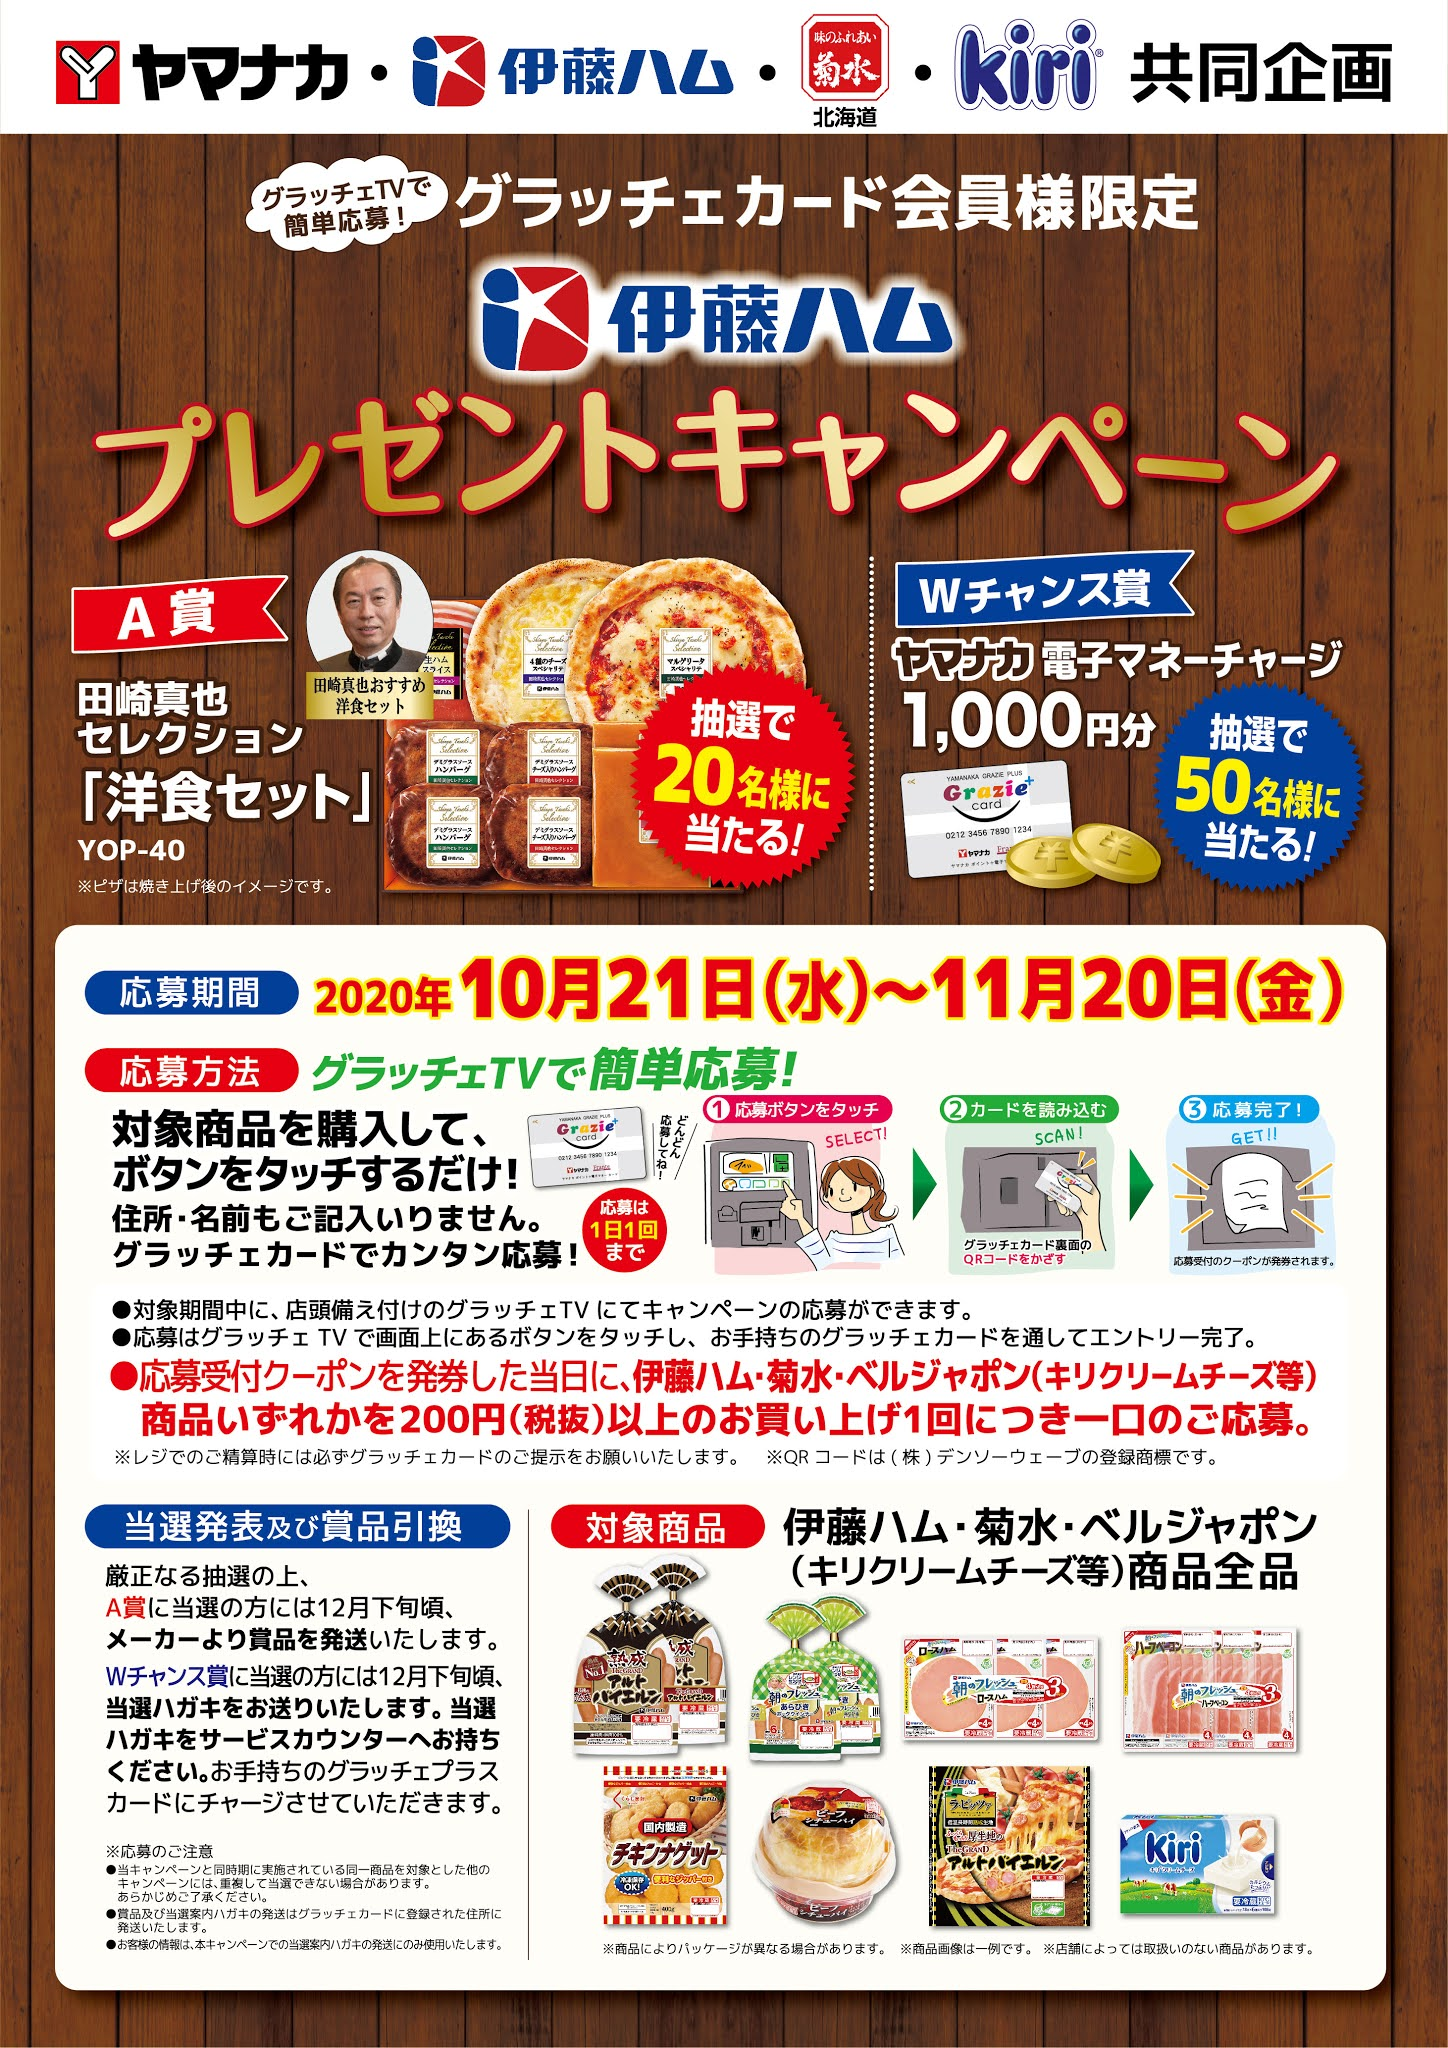 https://yamademo.com/yamanaka_test/super/wp-content/uploads/2020/10/201021_grazie_campaign_ito_kikusui_kiri.jpg